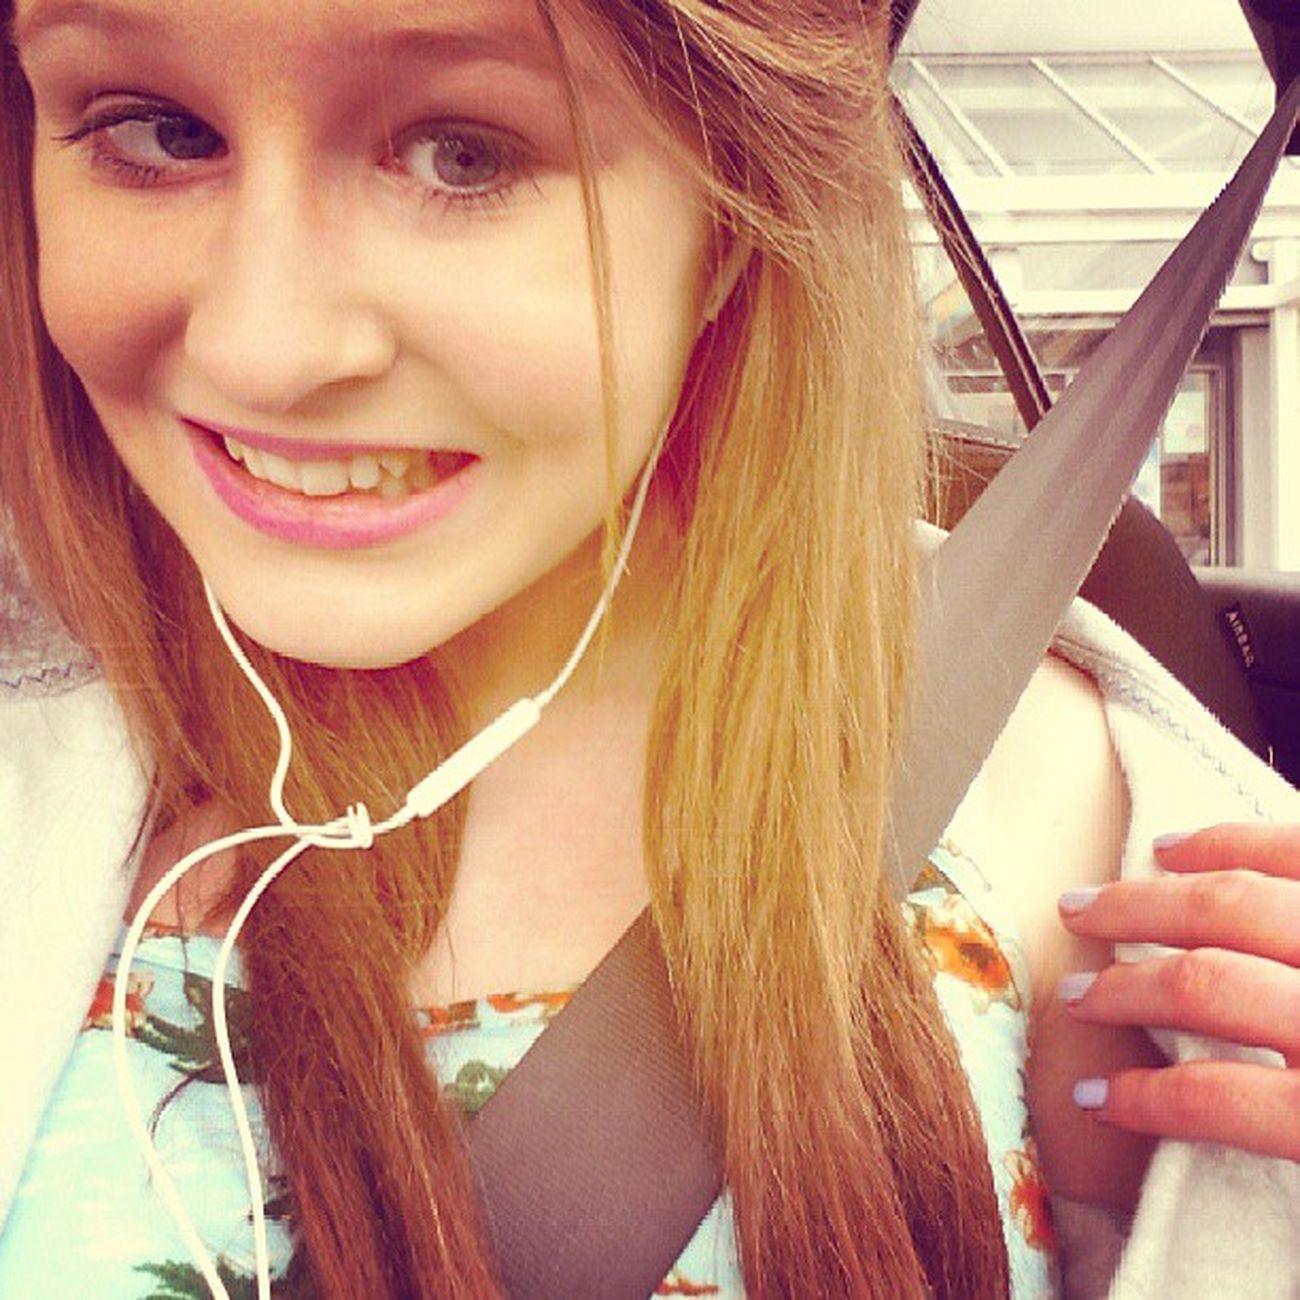 Blond Selfi Vainer Car seatbelt pinklips makeup girl random dabom gooday mwahh march colour